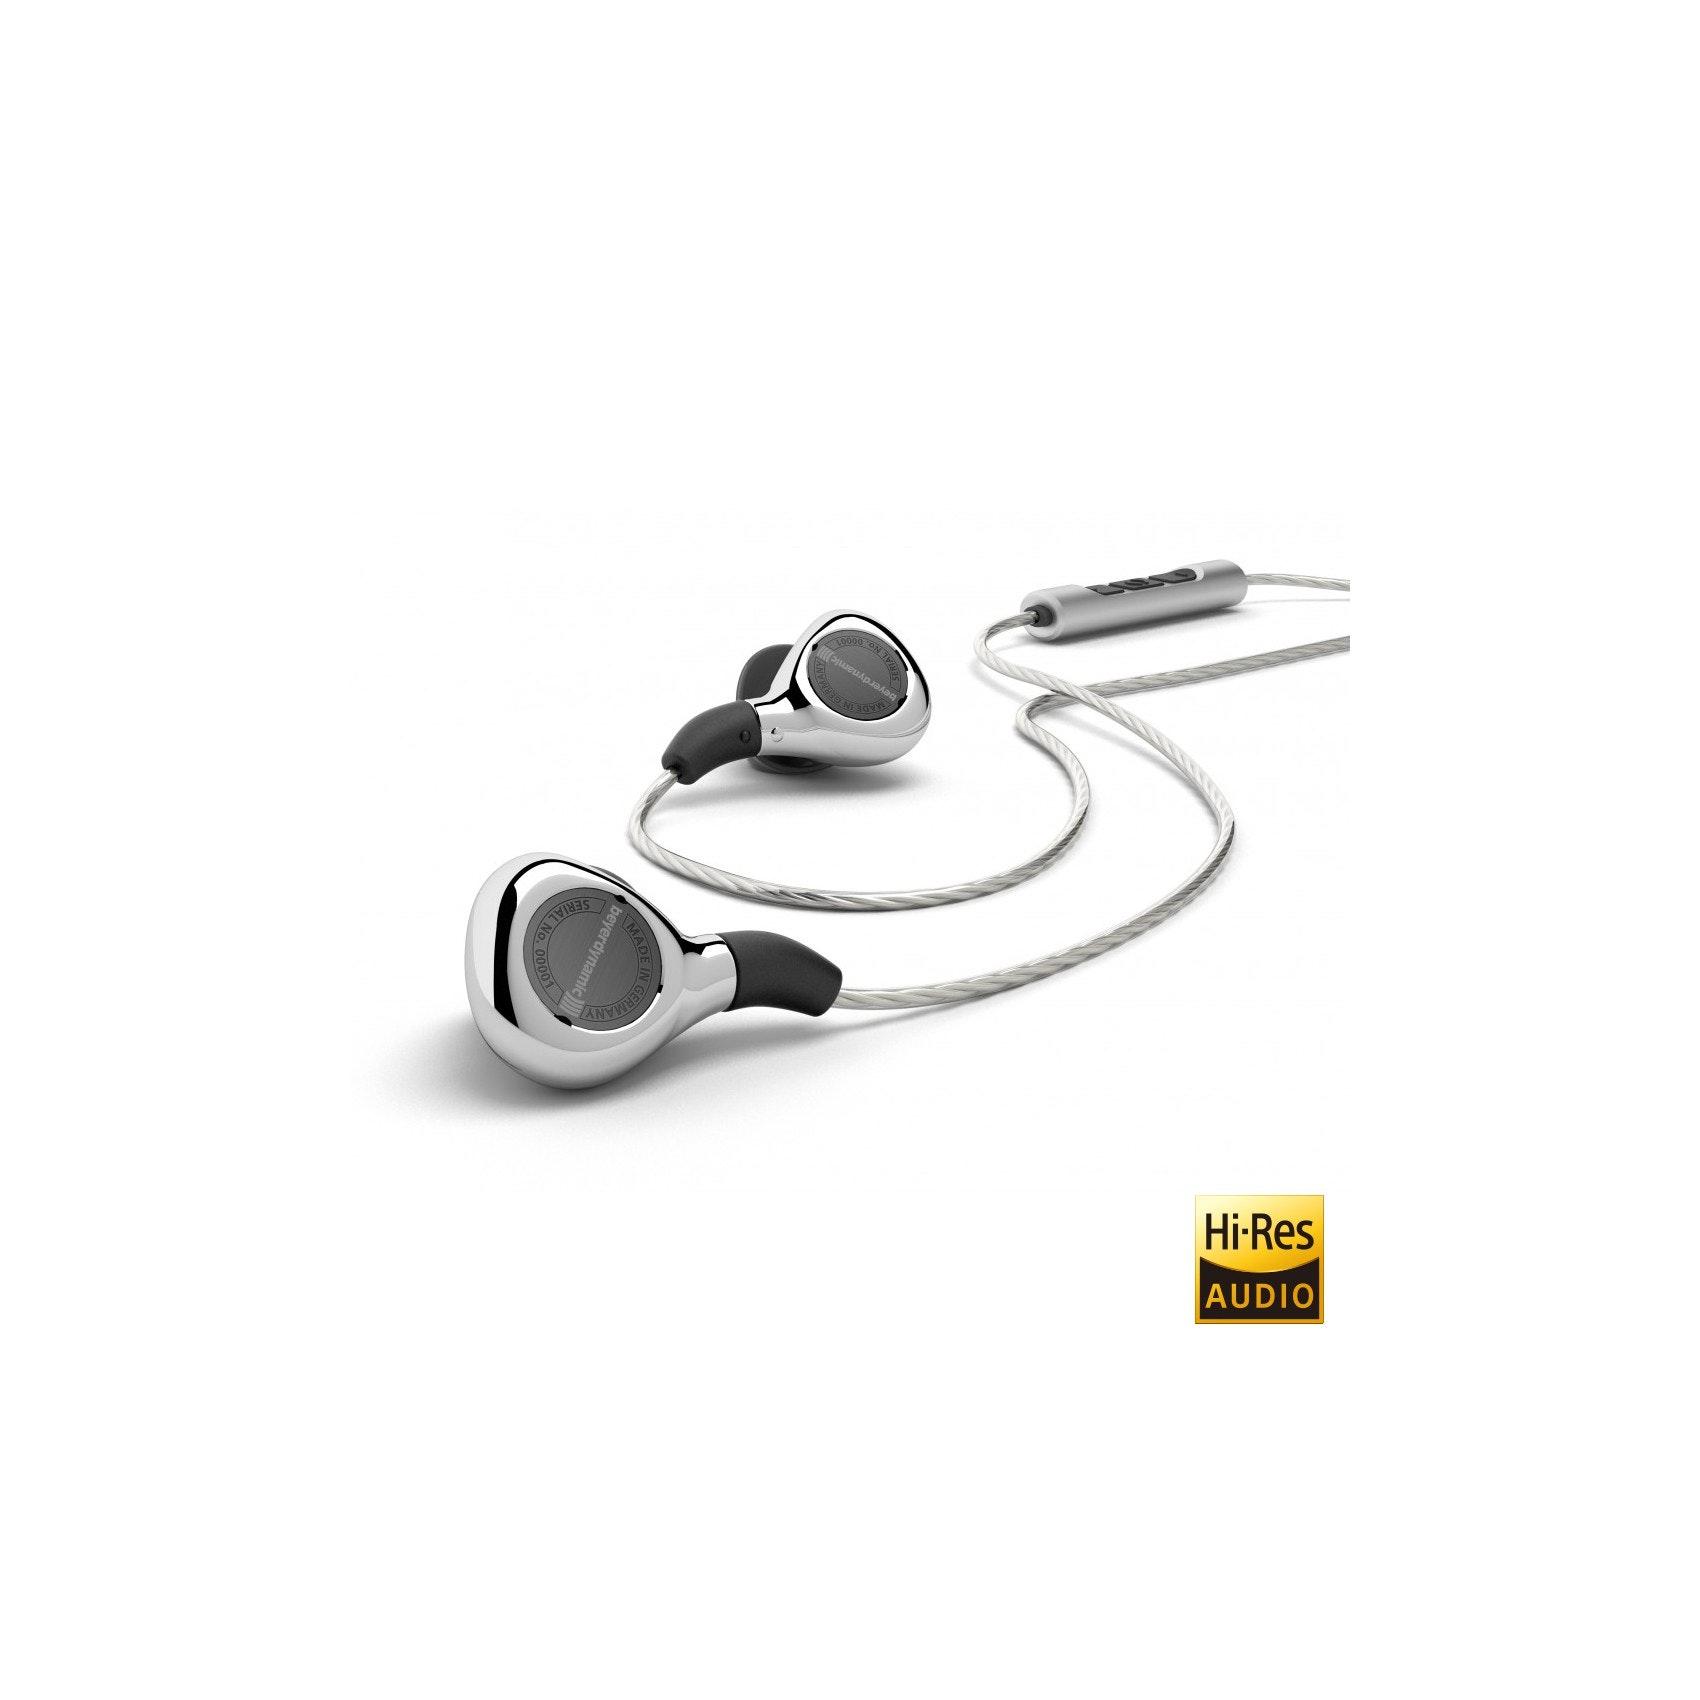 beyerdynamic Xelento remote: Audiophile Tesla in-ear